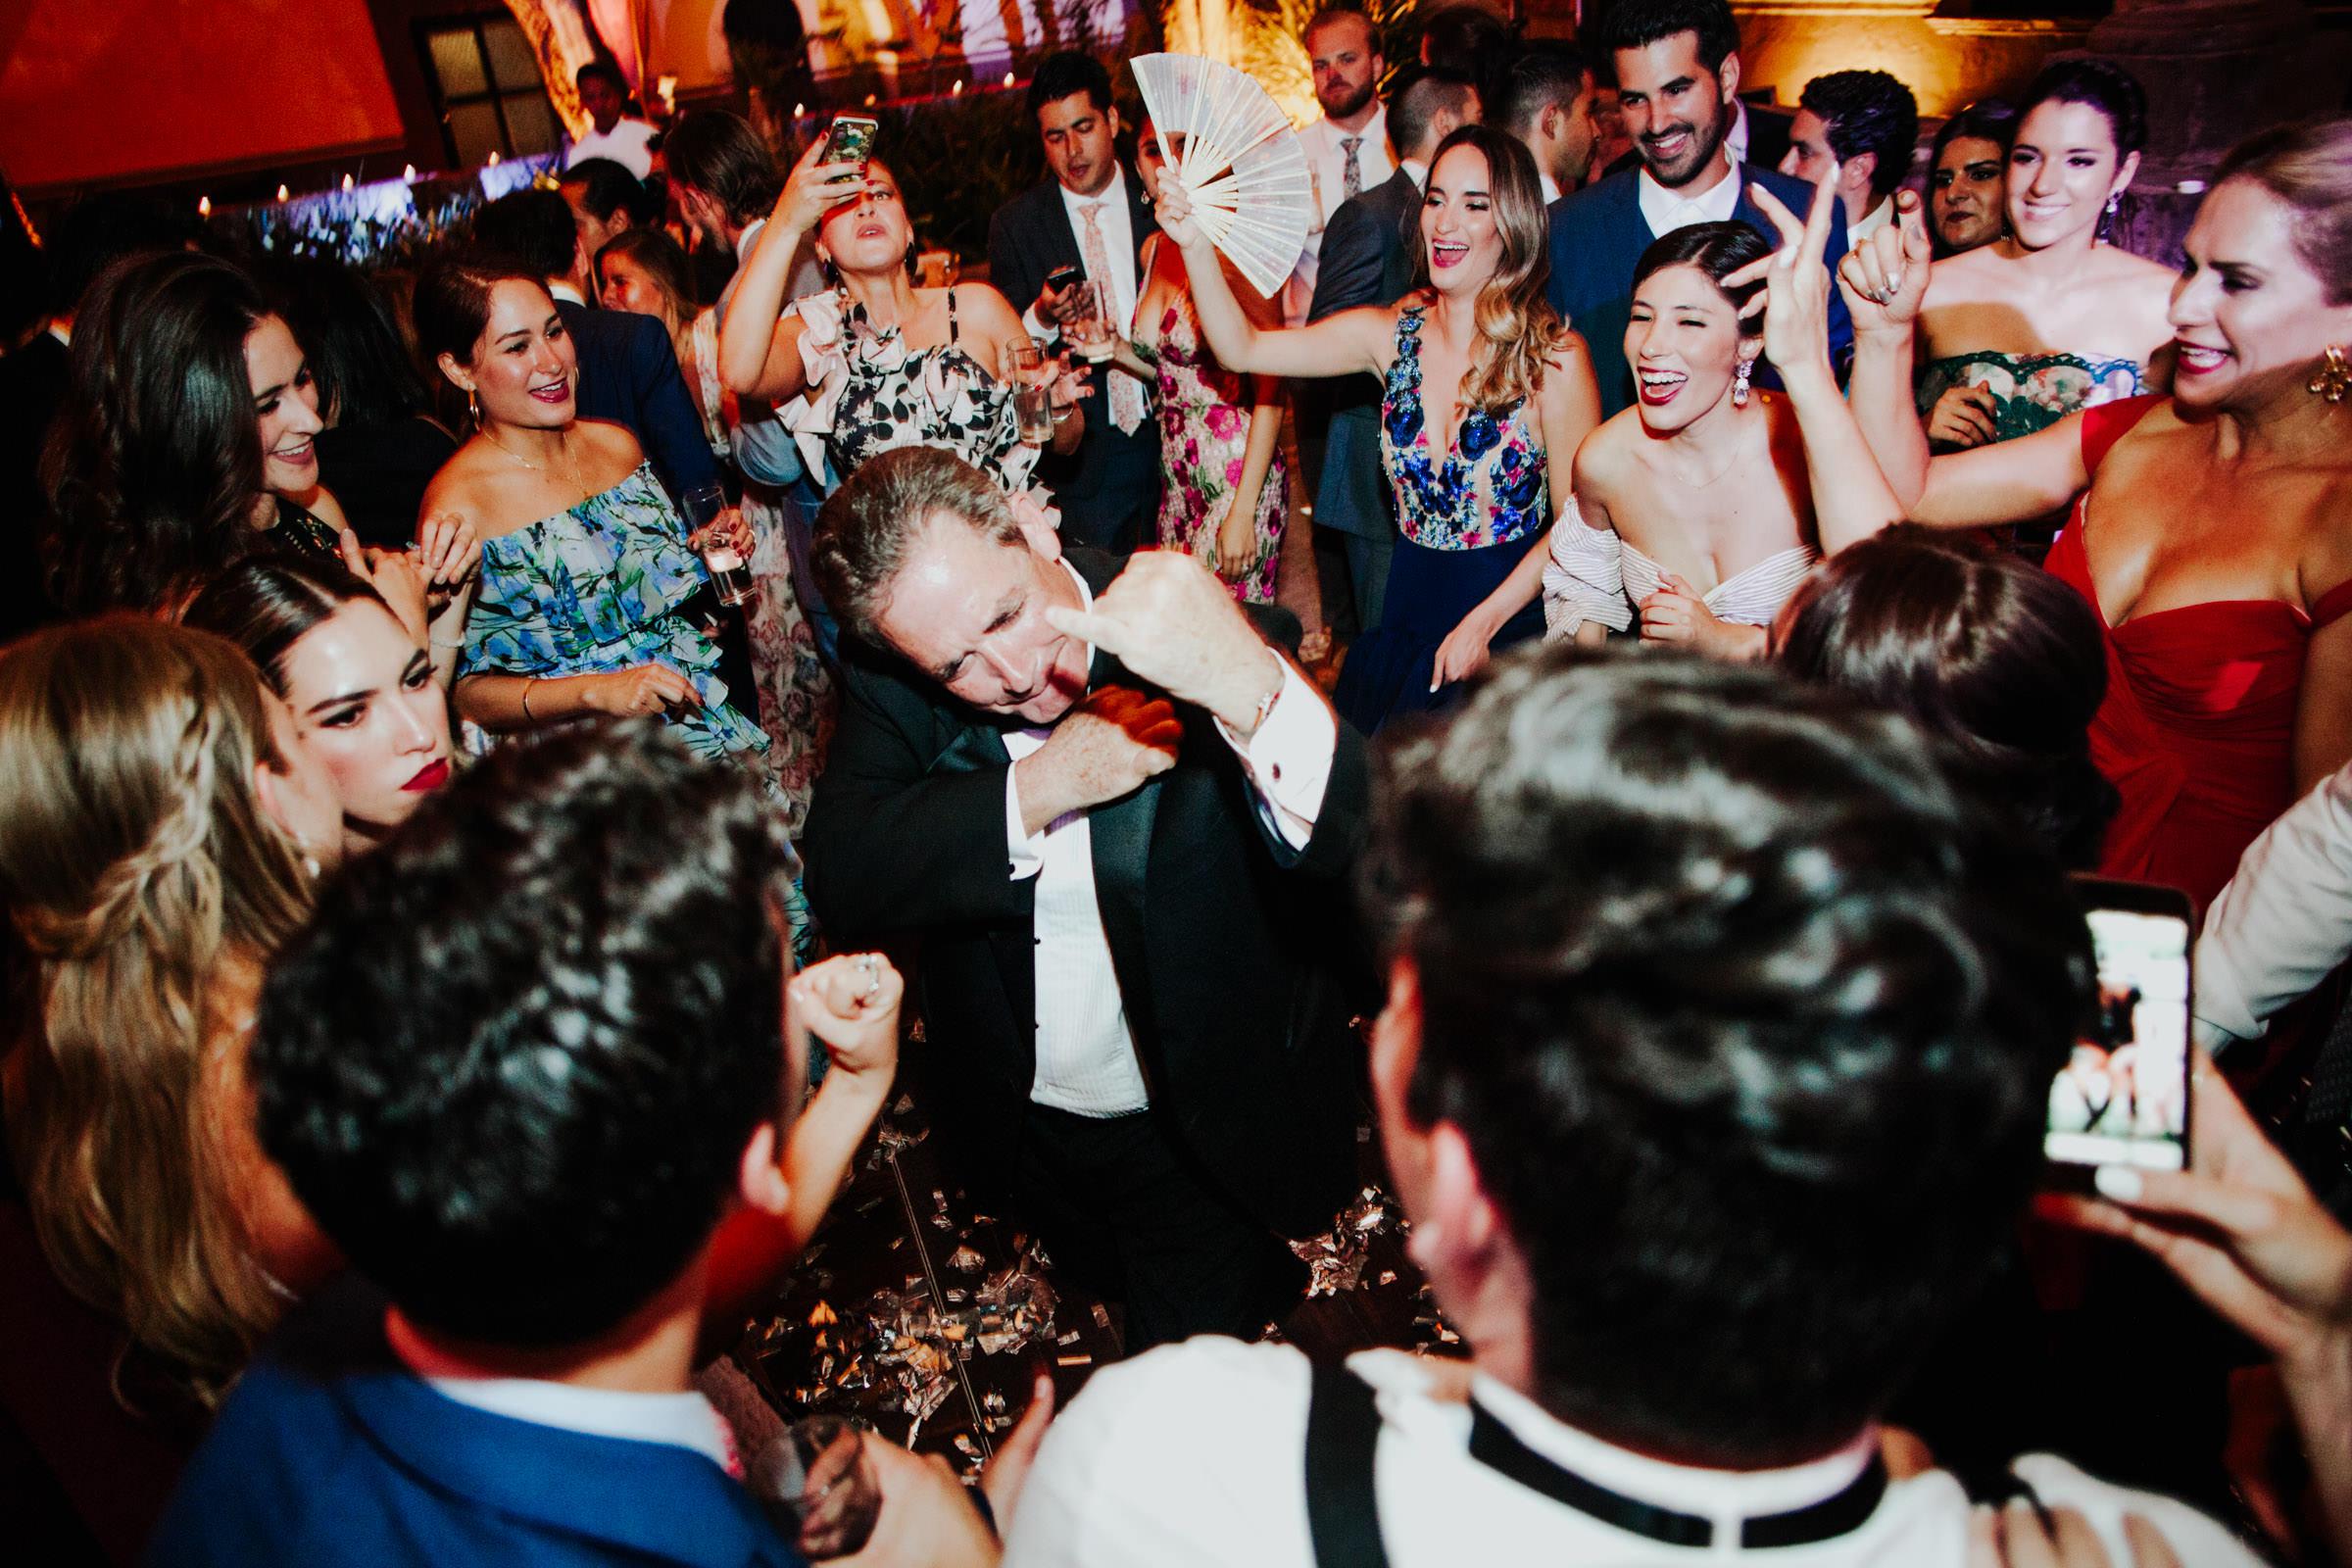 San-Miguel-de-Allende-Wedding-Photography-Parroquia-Instituto-Boda-Fotografia-Fer-Sergio-Pierce-Lifestyle-Photography0062.JPG